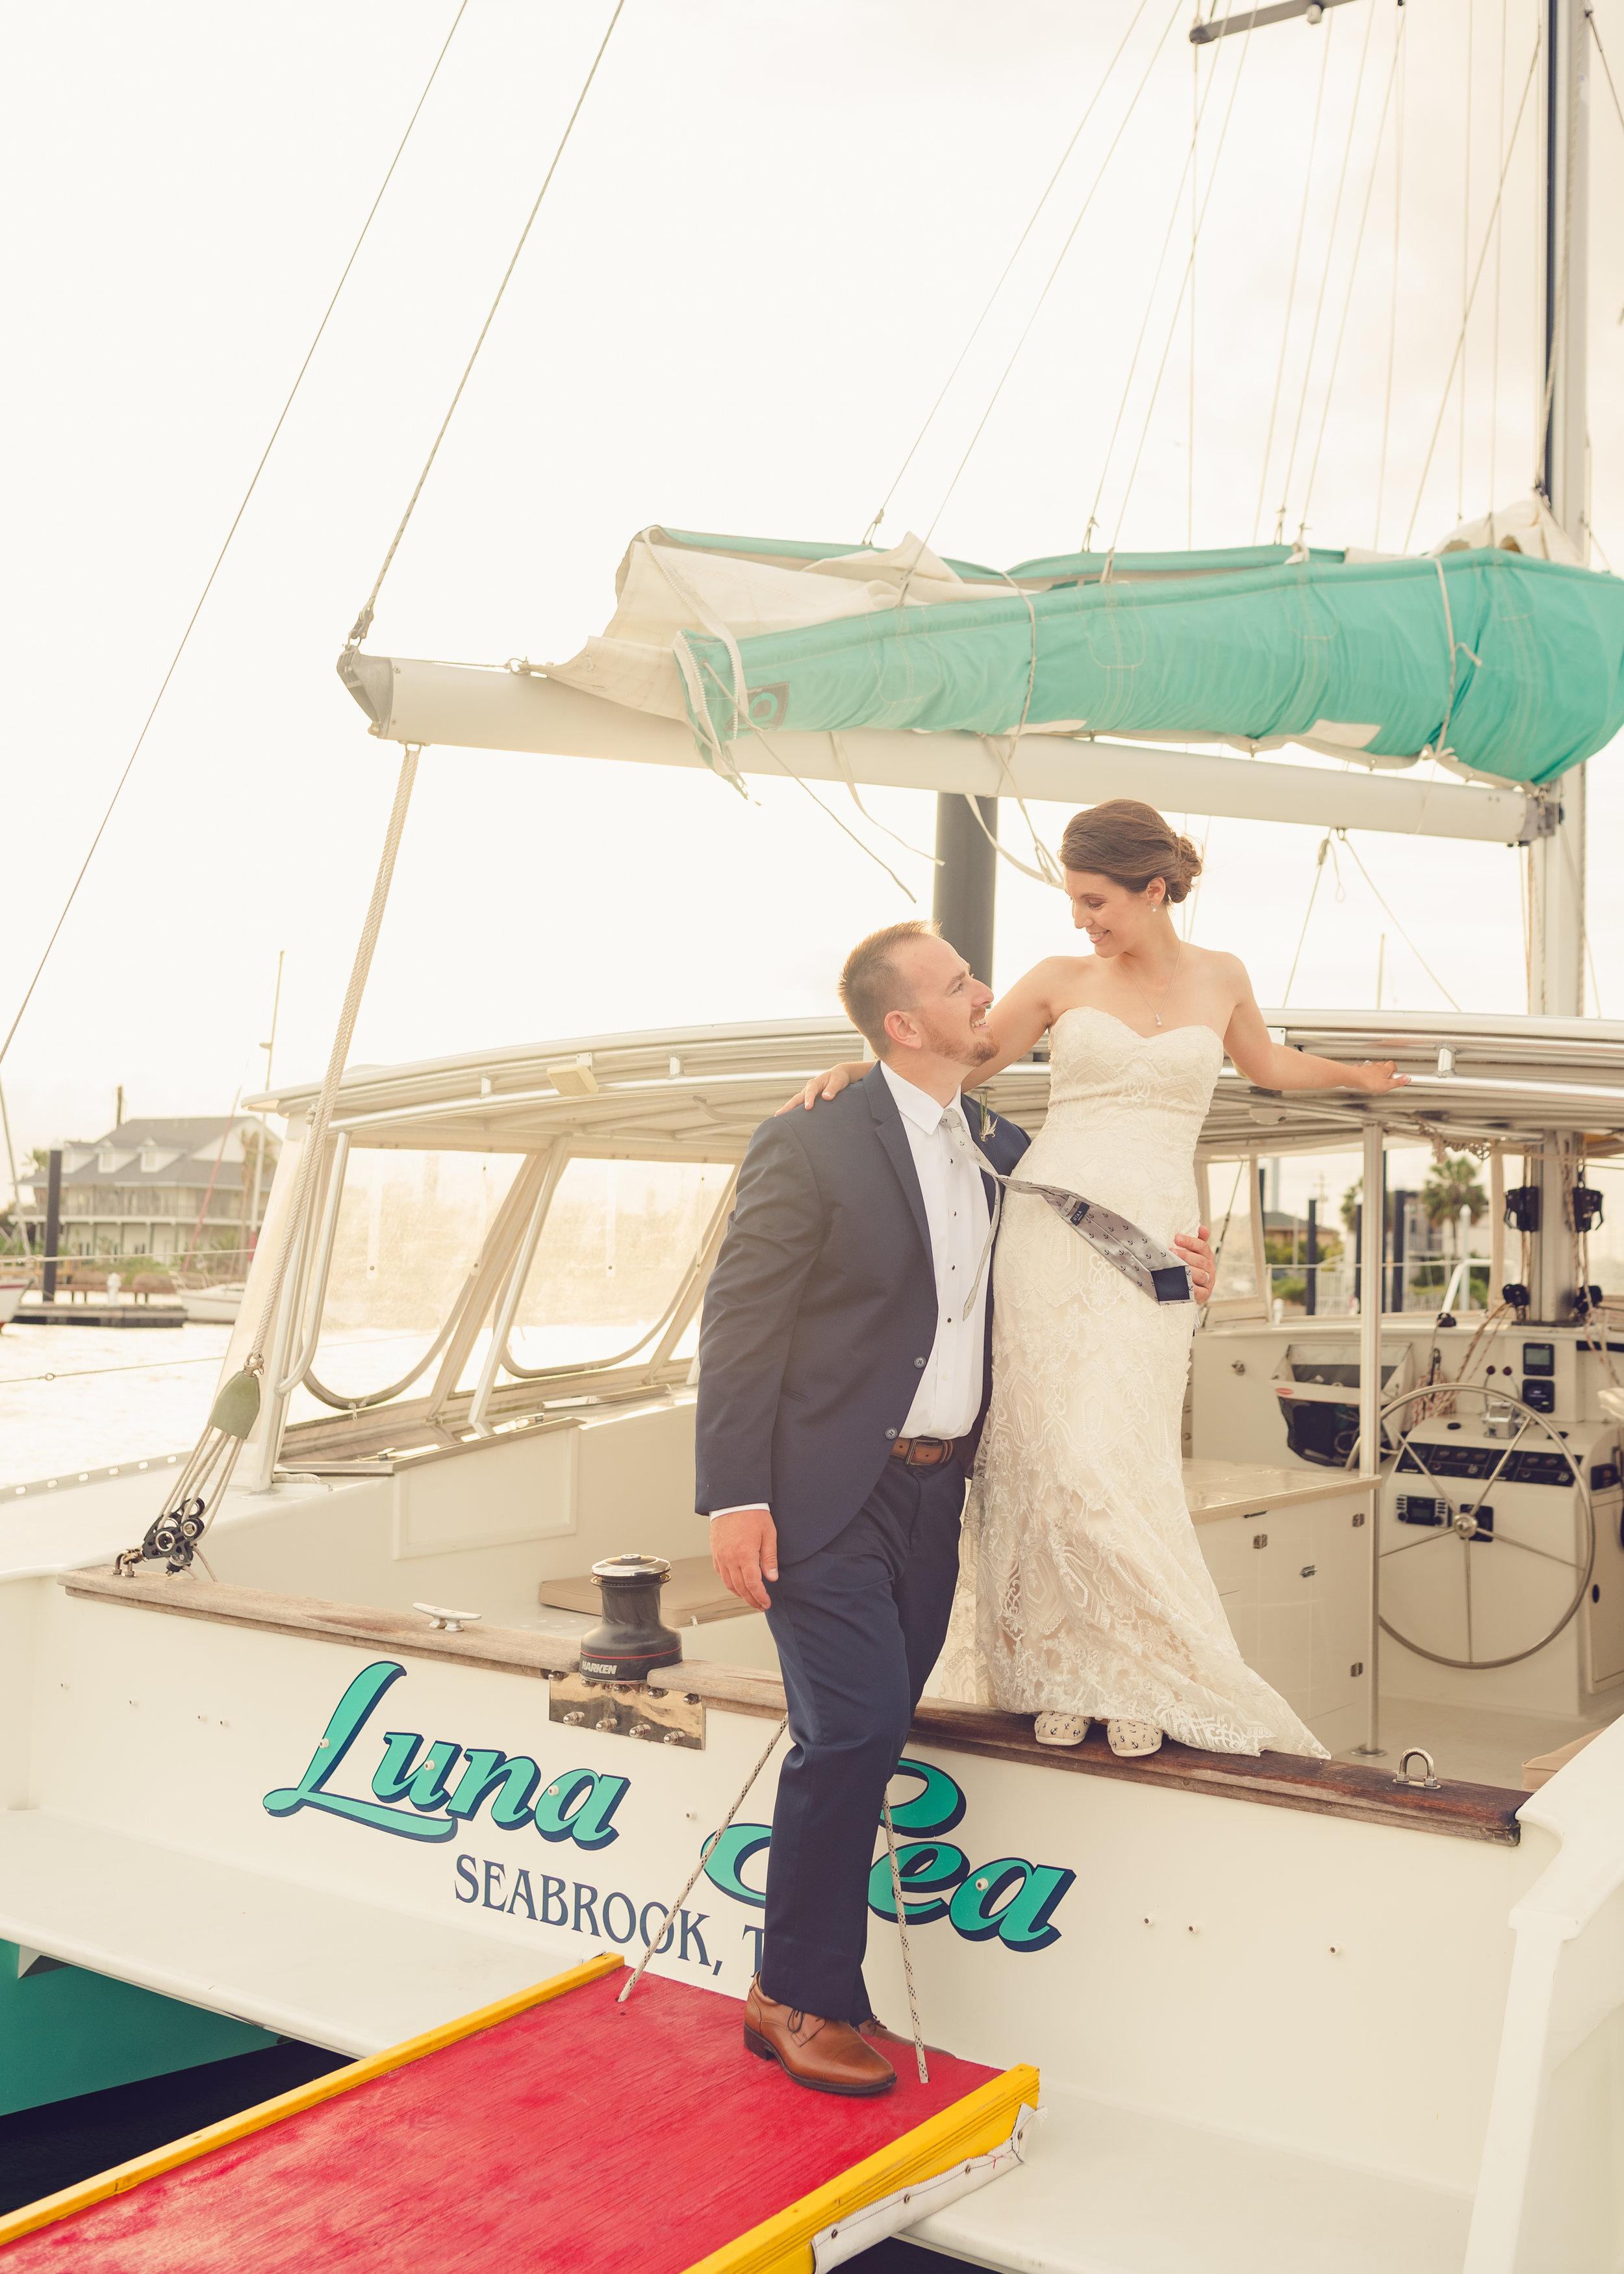 Wedding Reception Sail-away Exit